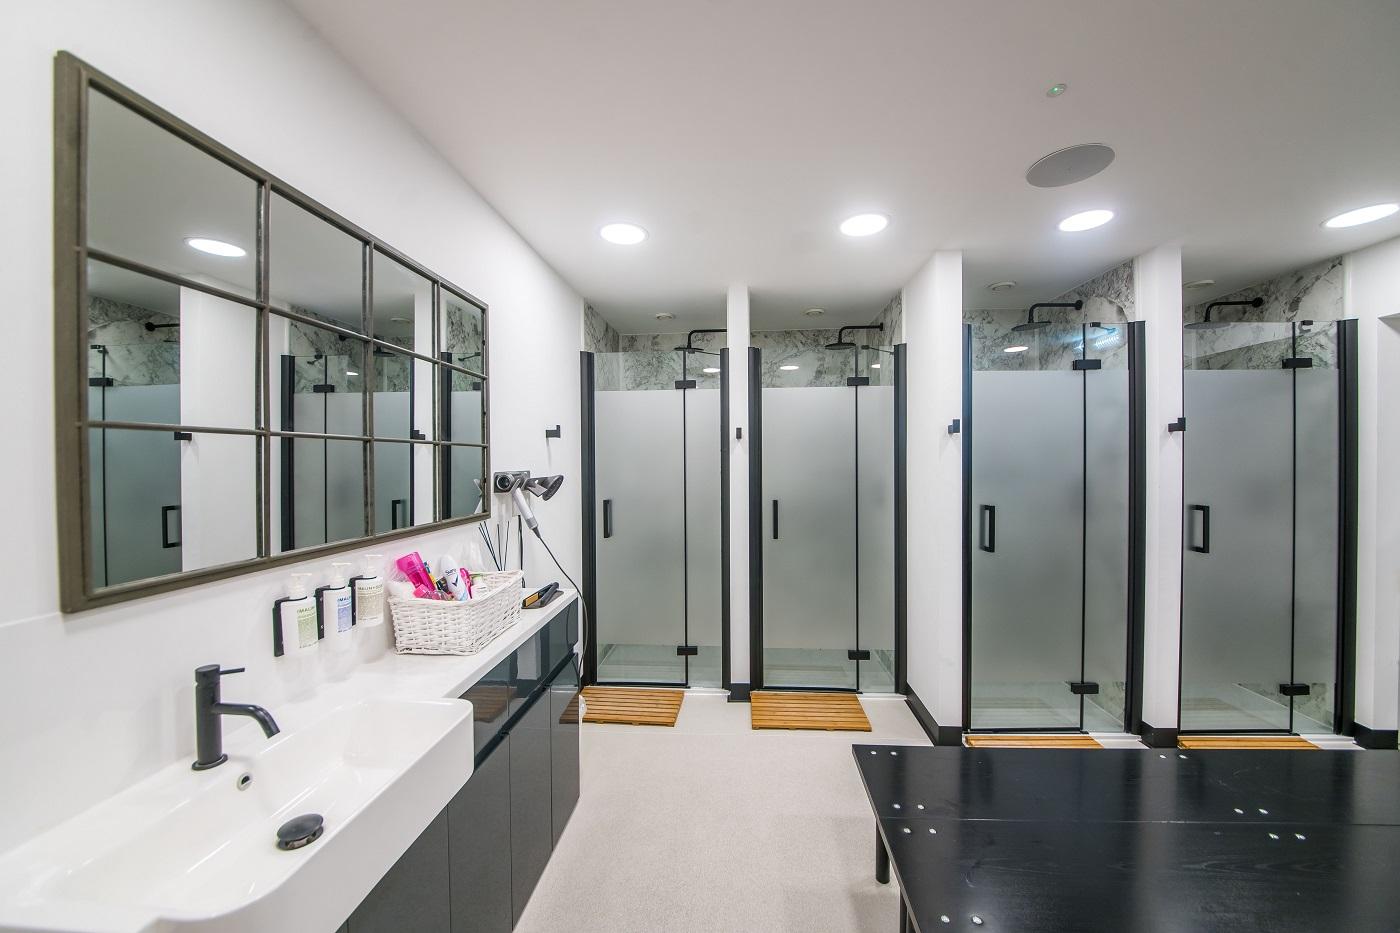 Studio XXVI changing rooms in Milsom Place